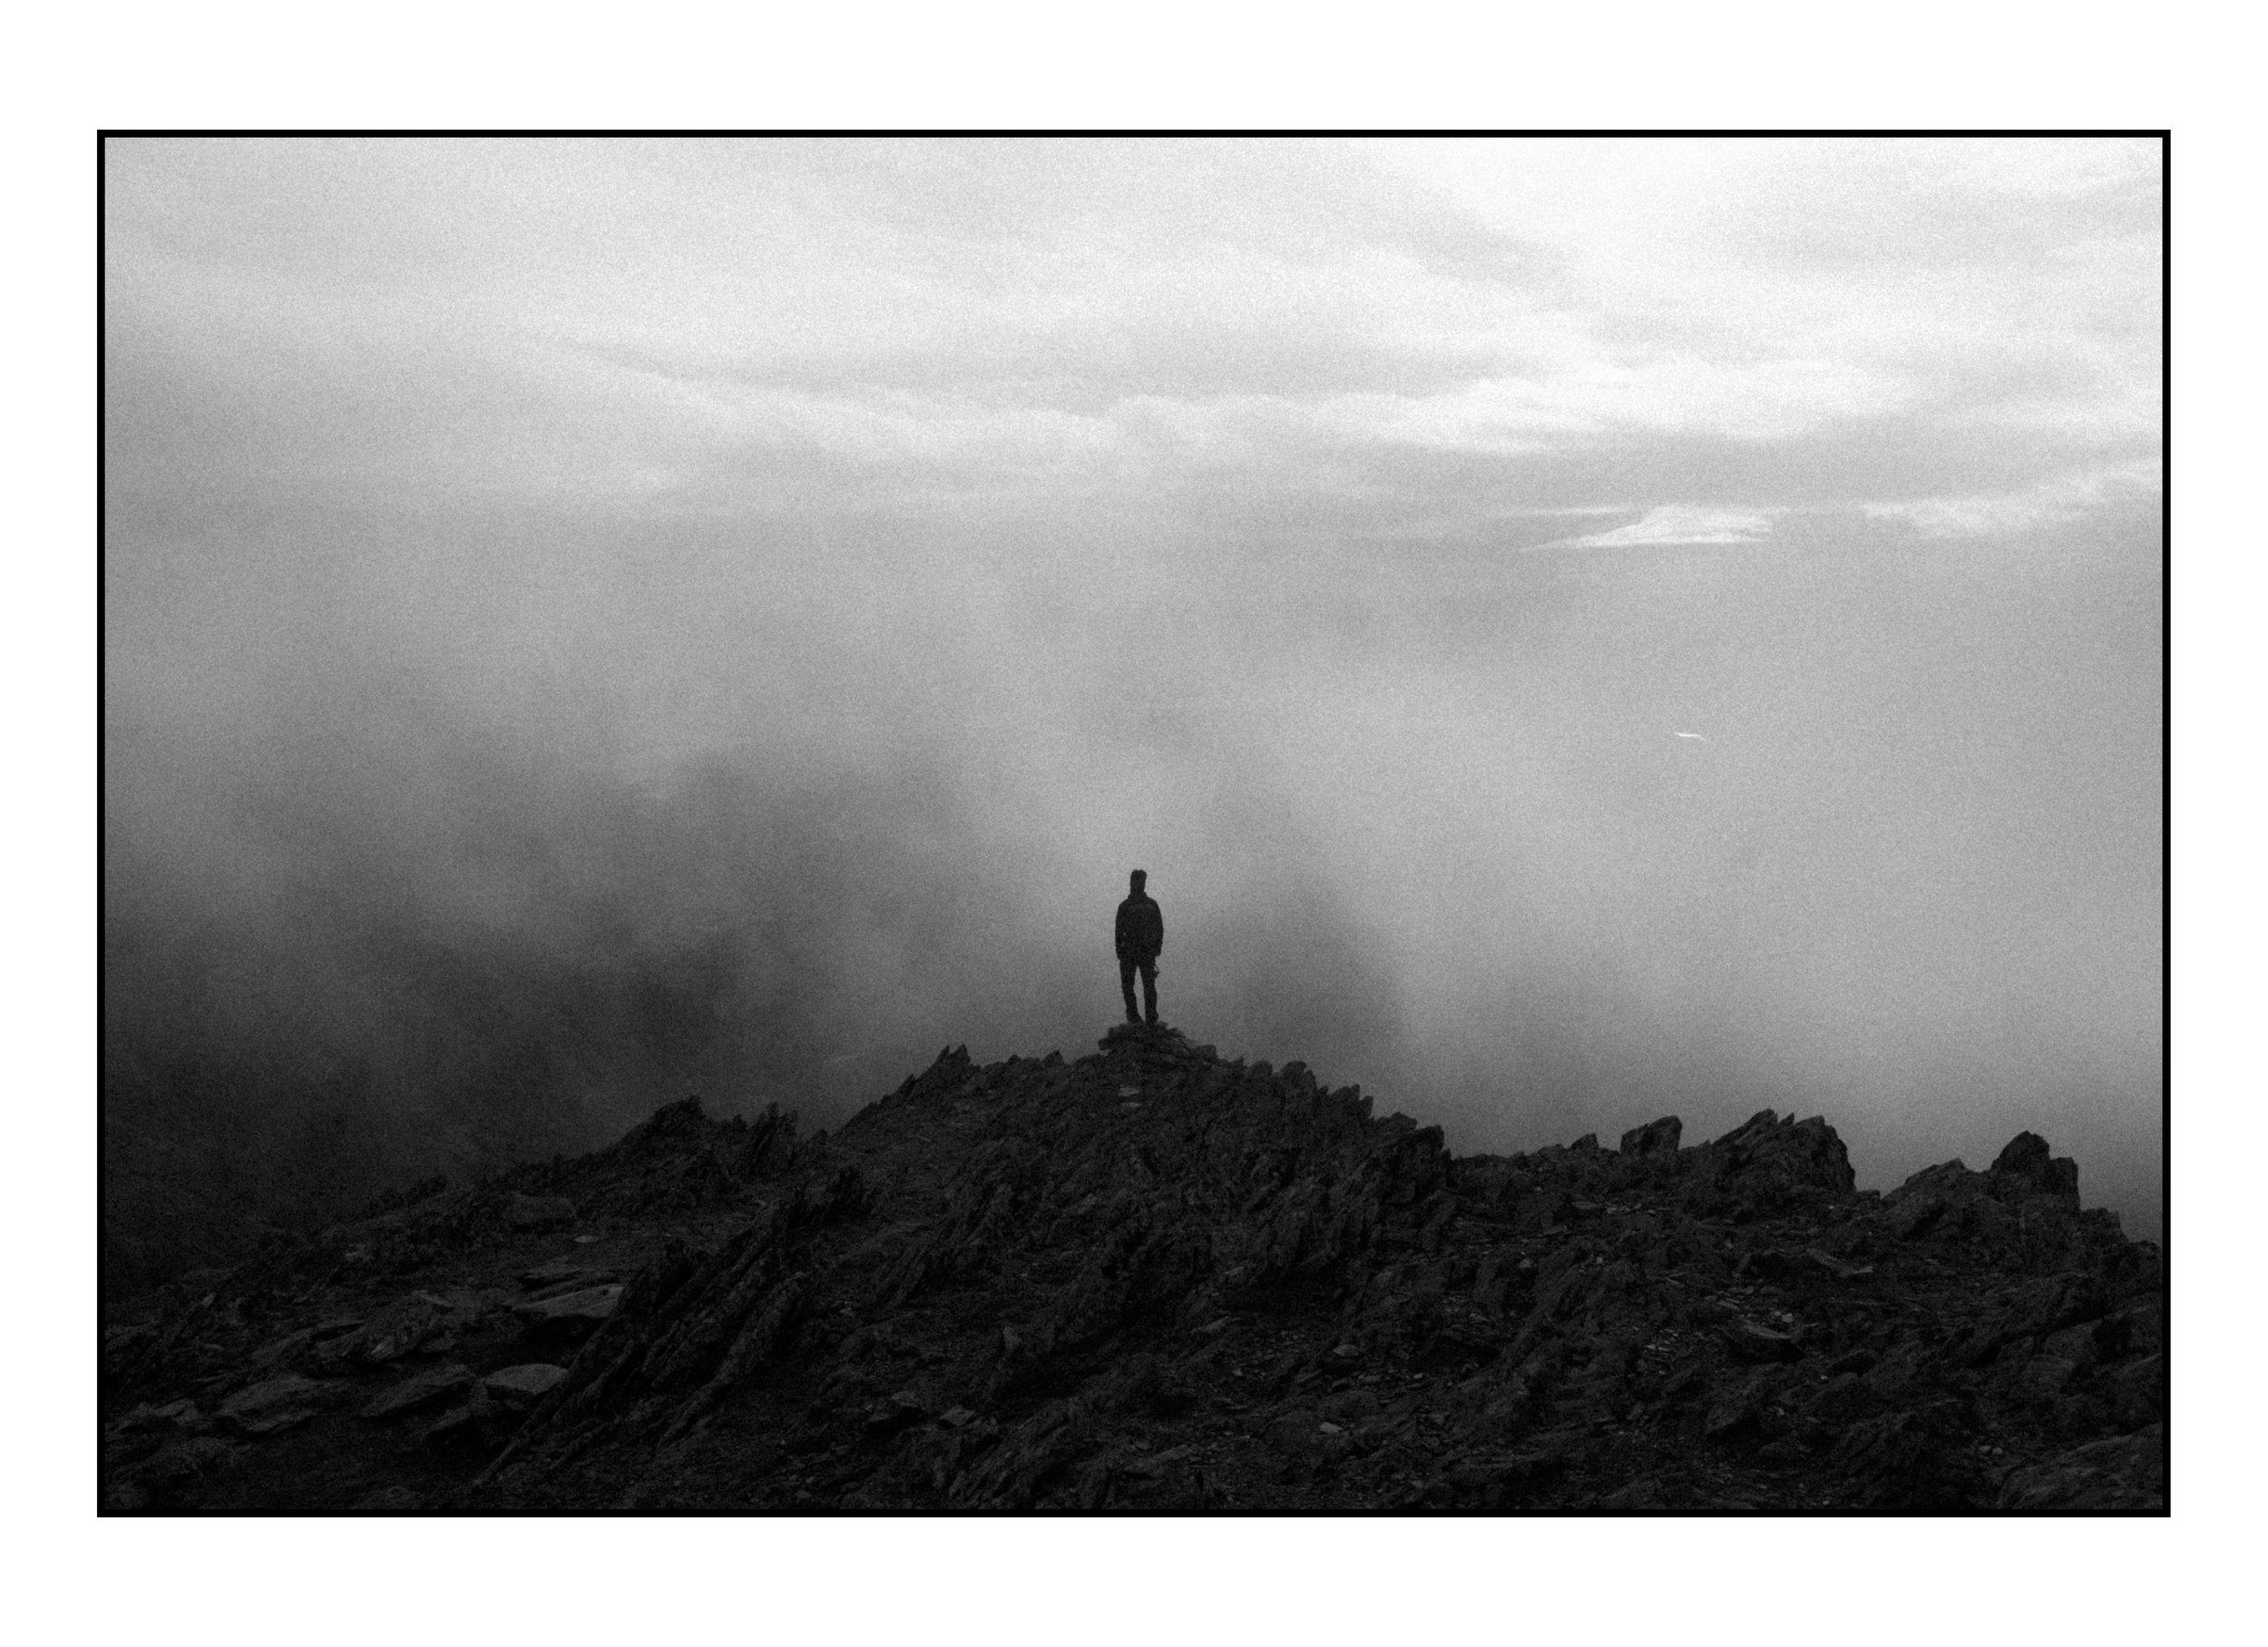 Silence and calm - Photo: Carlos Mejino